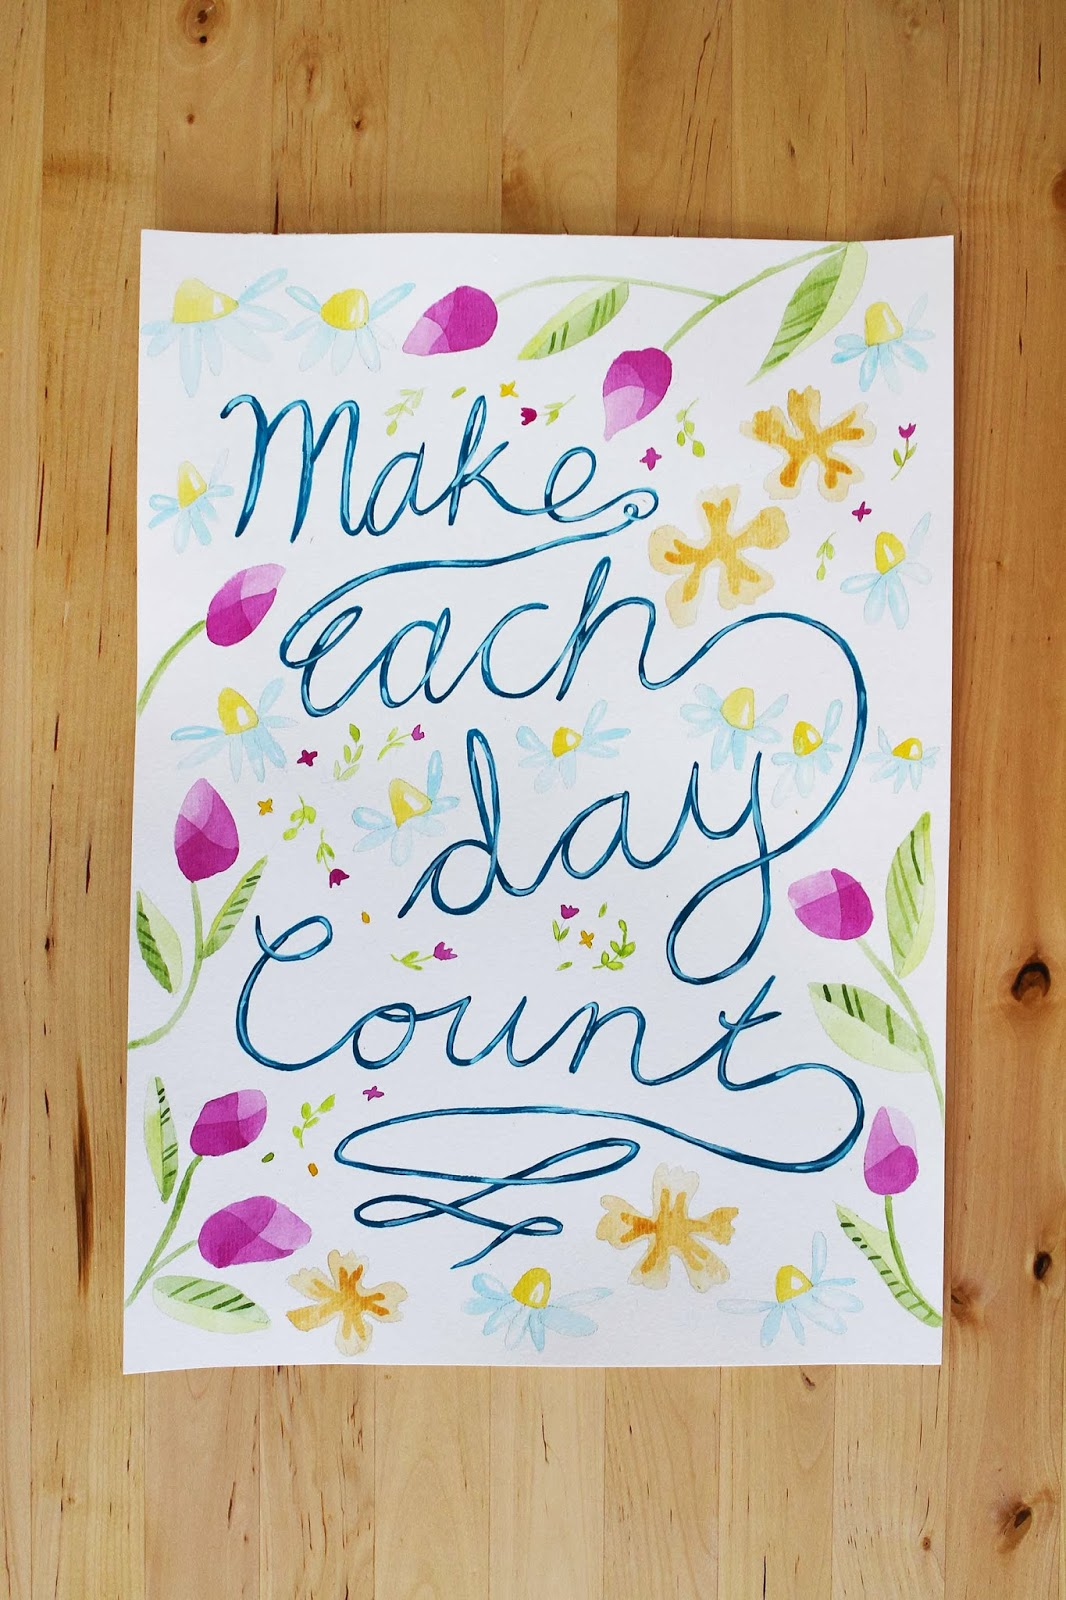 original paintings artworks nature lettering flowers inspirational happy